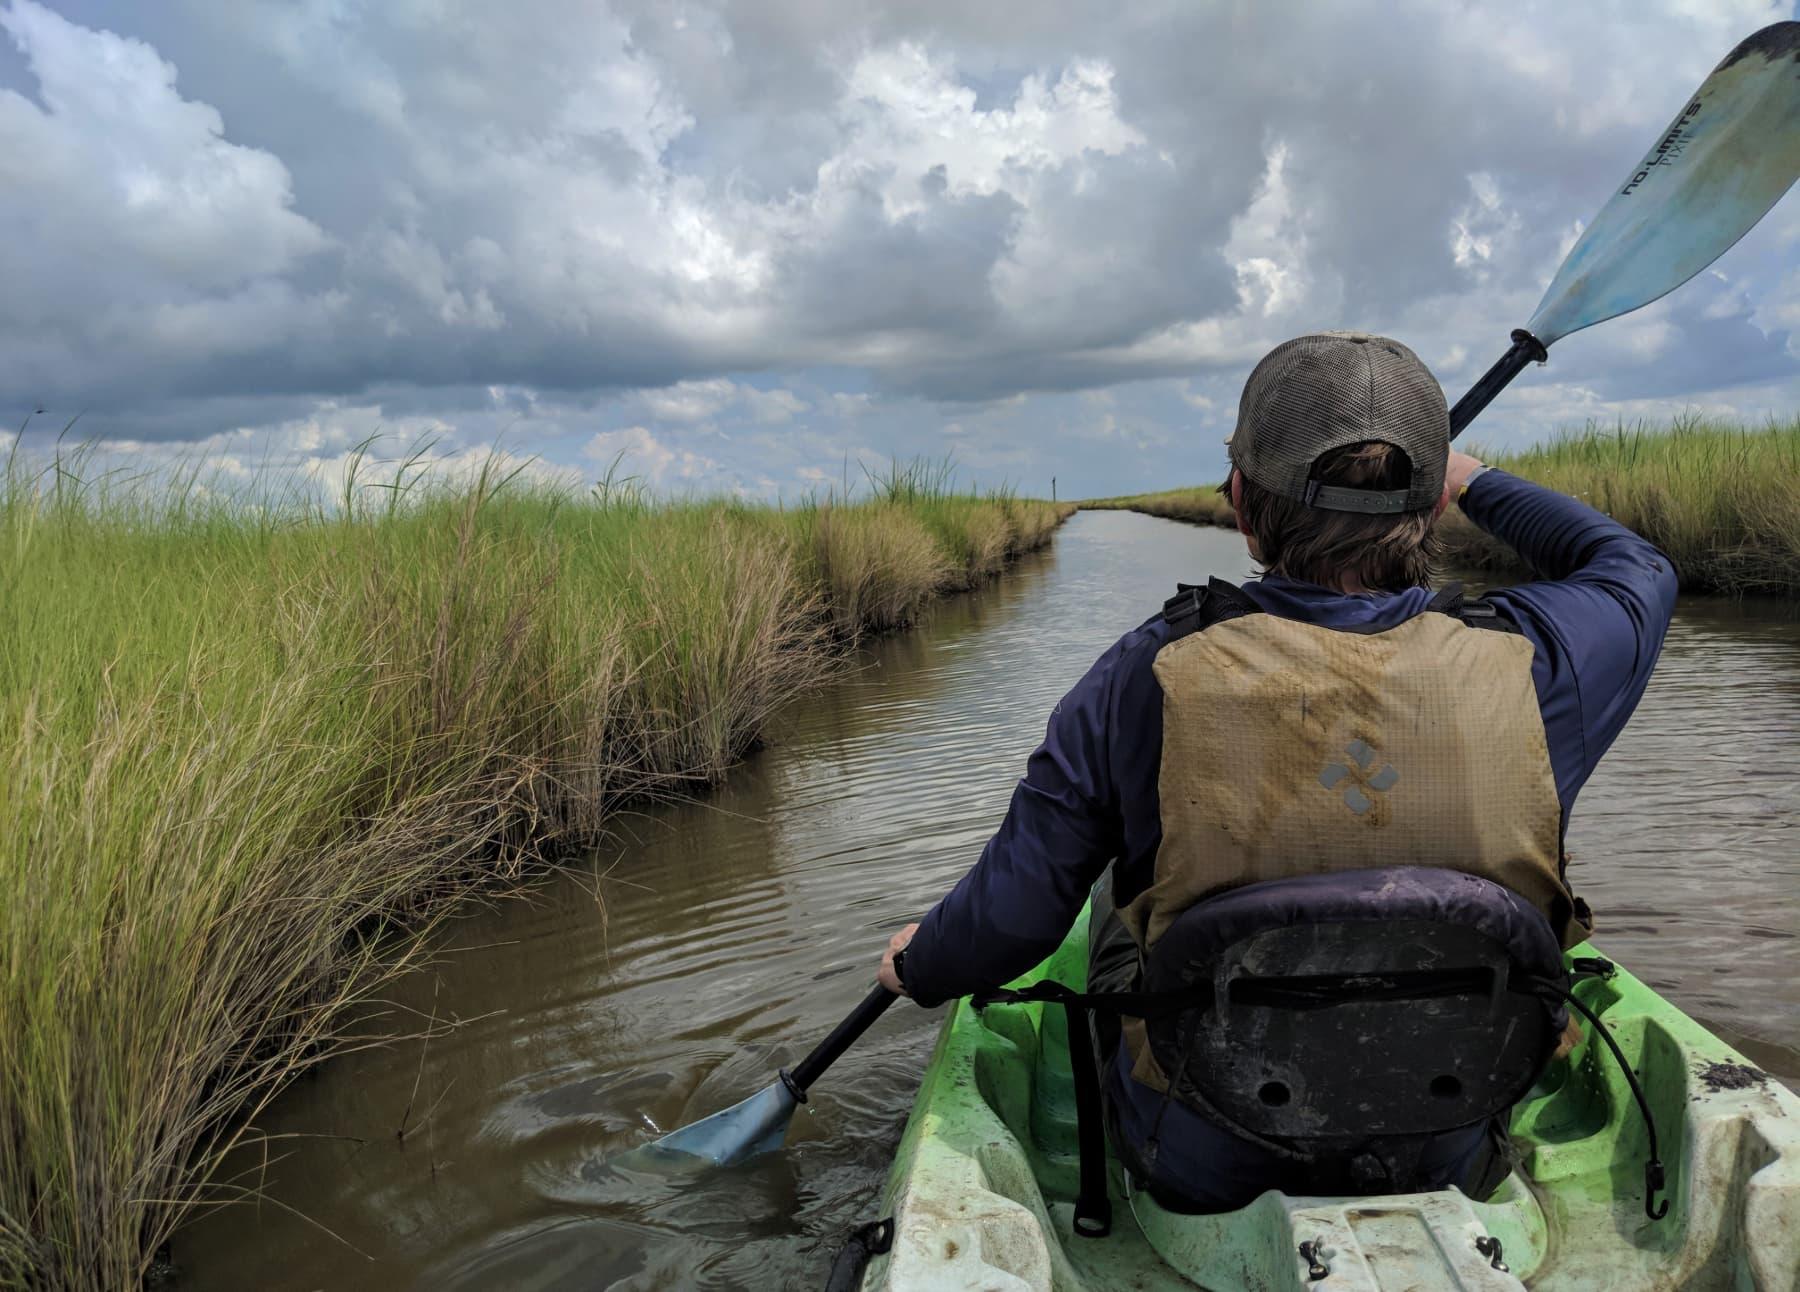 overcast sky and man paddling green kayak through marshy channel